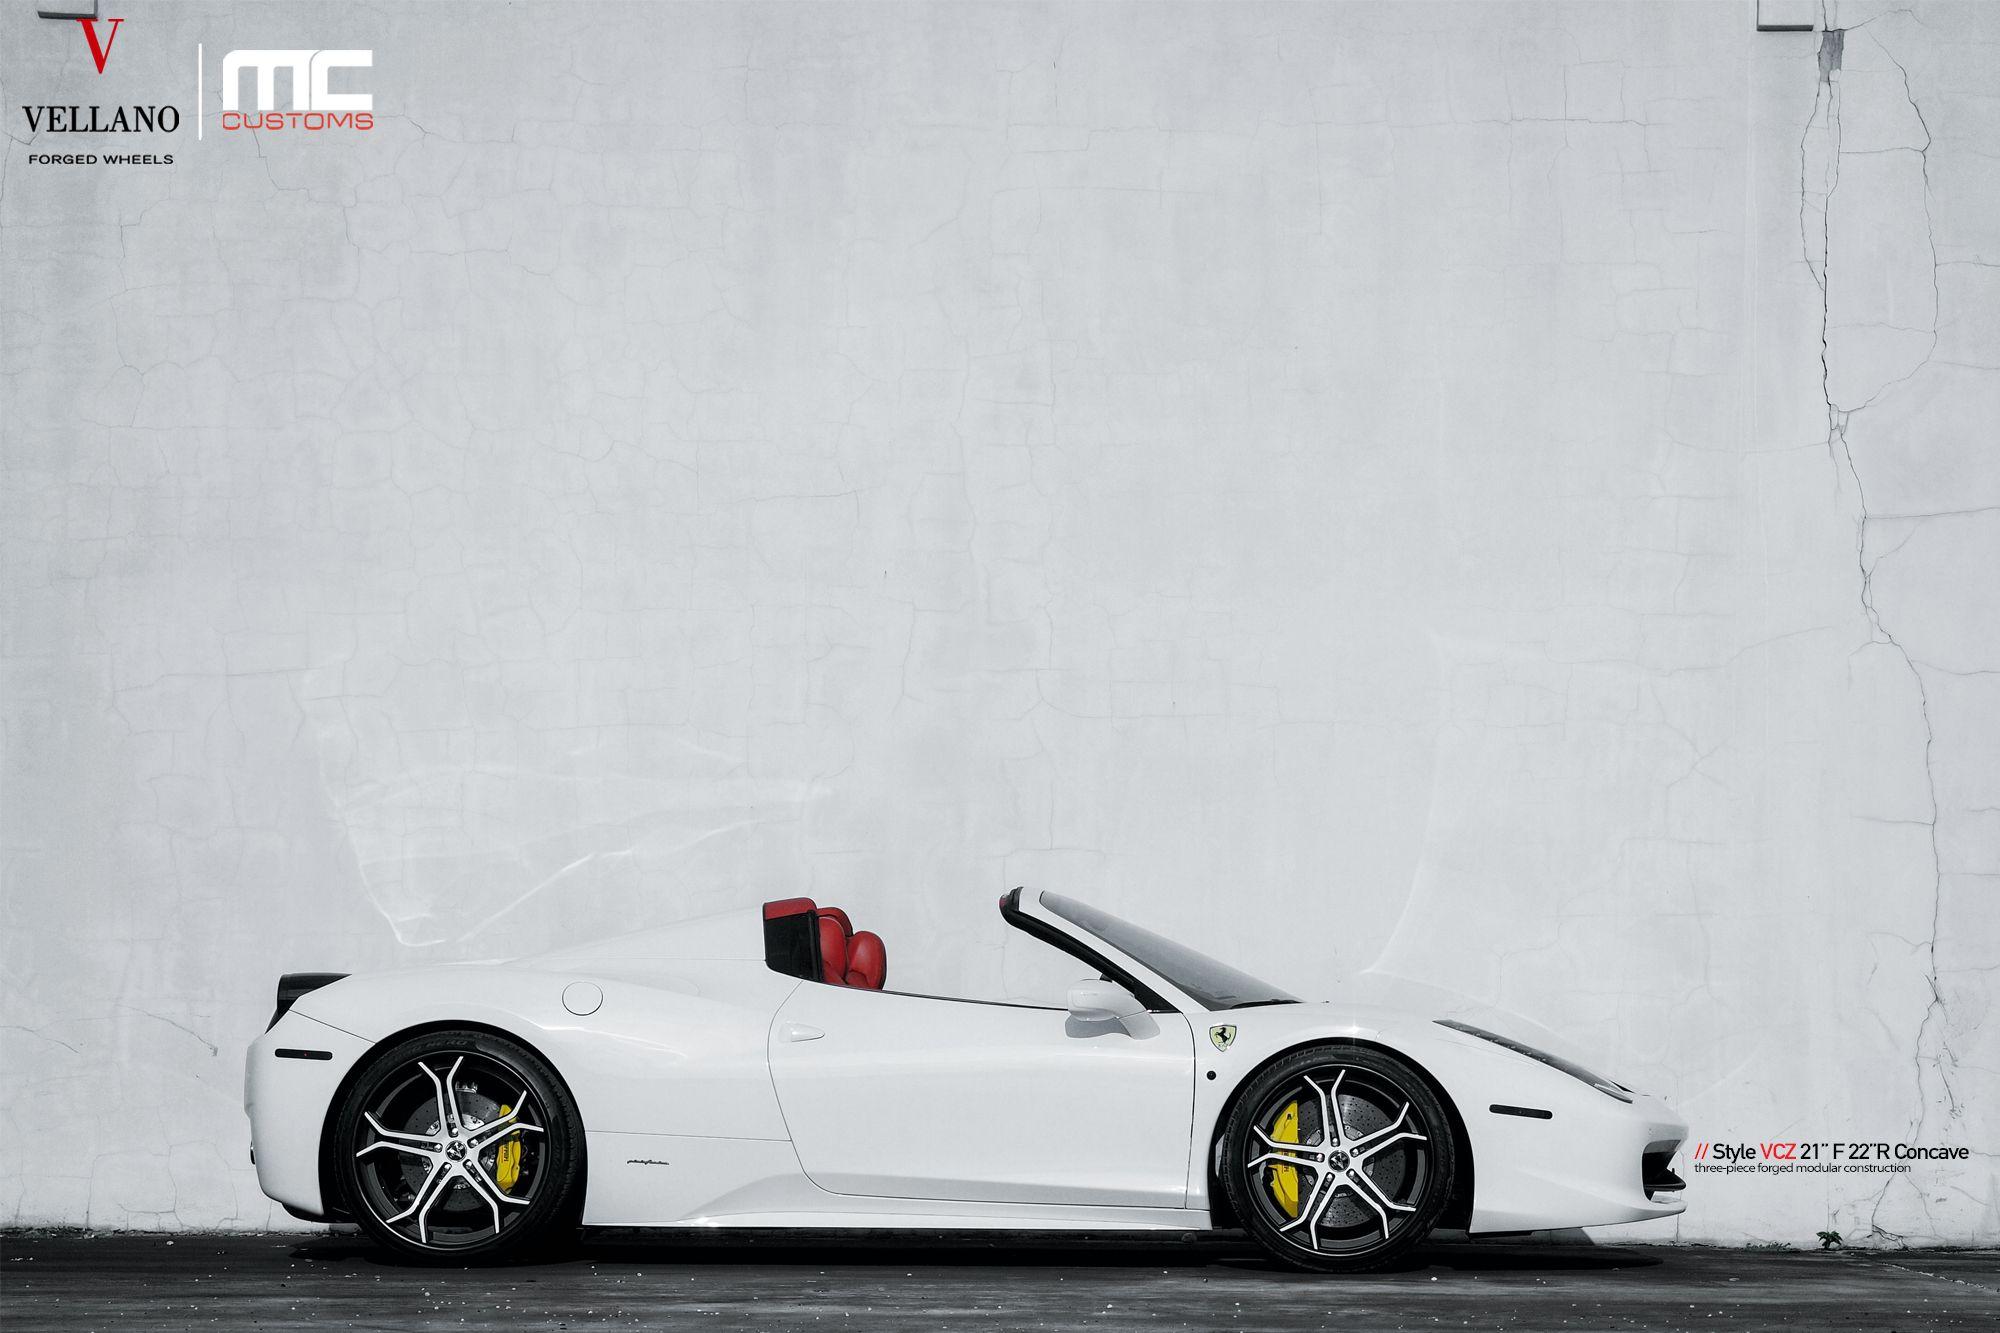 "Stunning Ferrari 458 | Vellano VCZ 21"" F 22"" R Concave Three piece forged wheels"